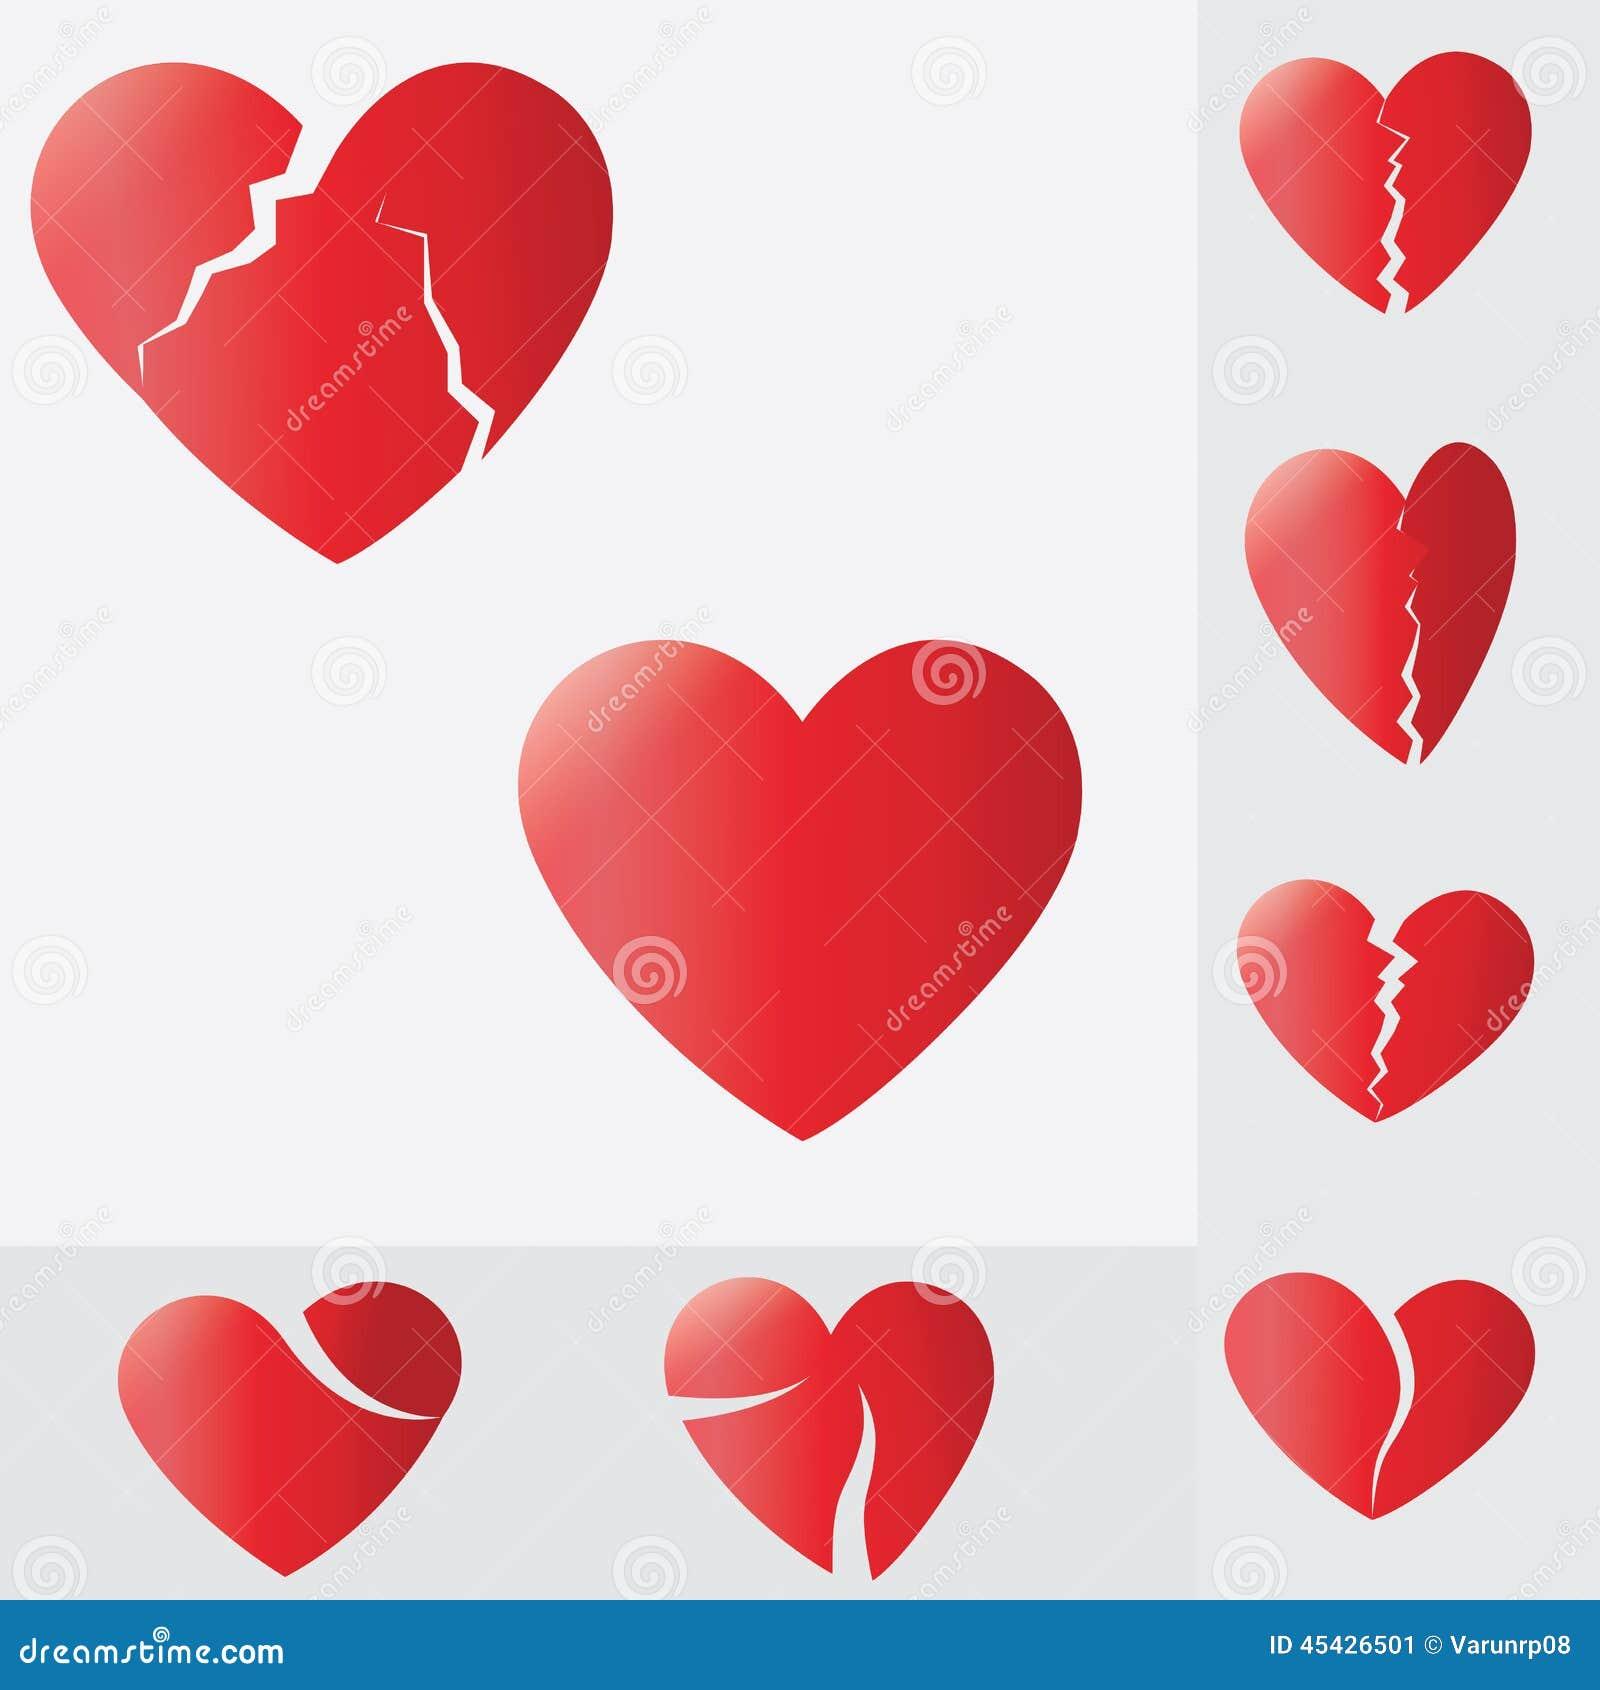 Broken heartheart splitting and breaking apart love symbol stock broken heartheart splitting and breaking apart love symbol buycottarizona